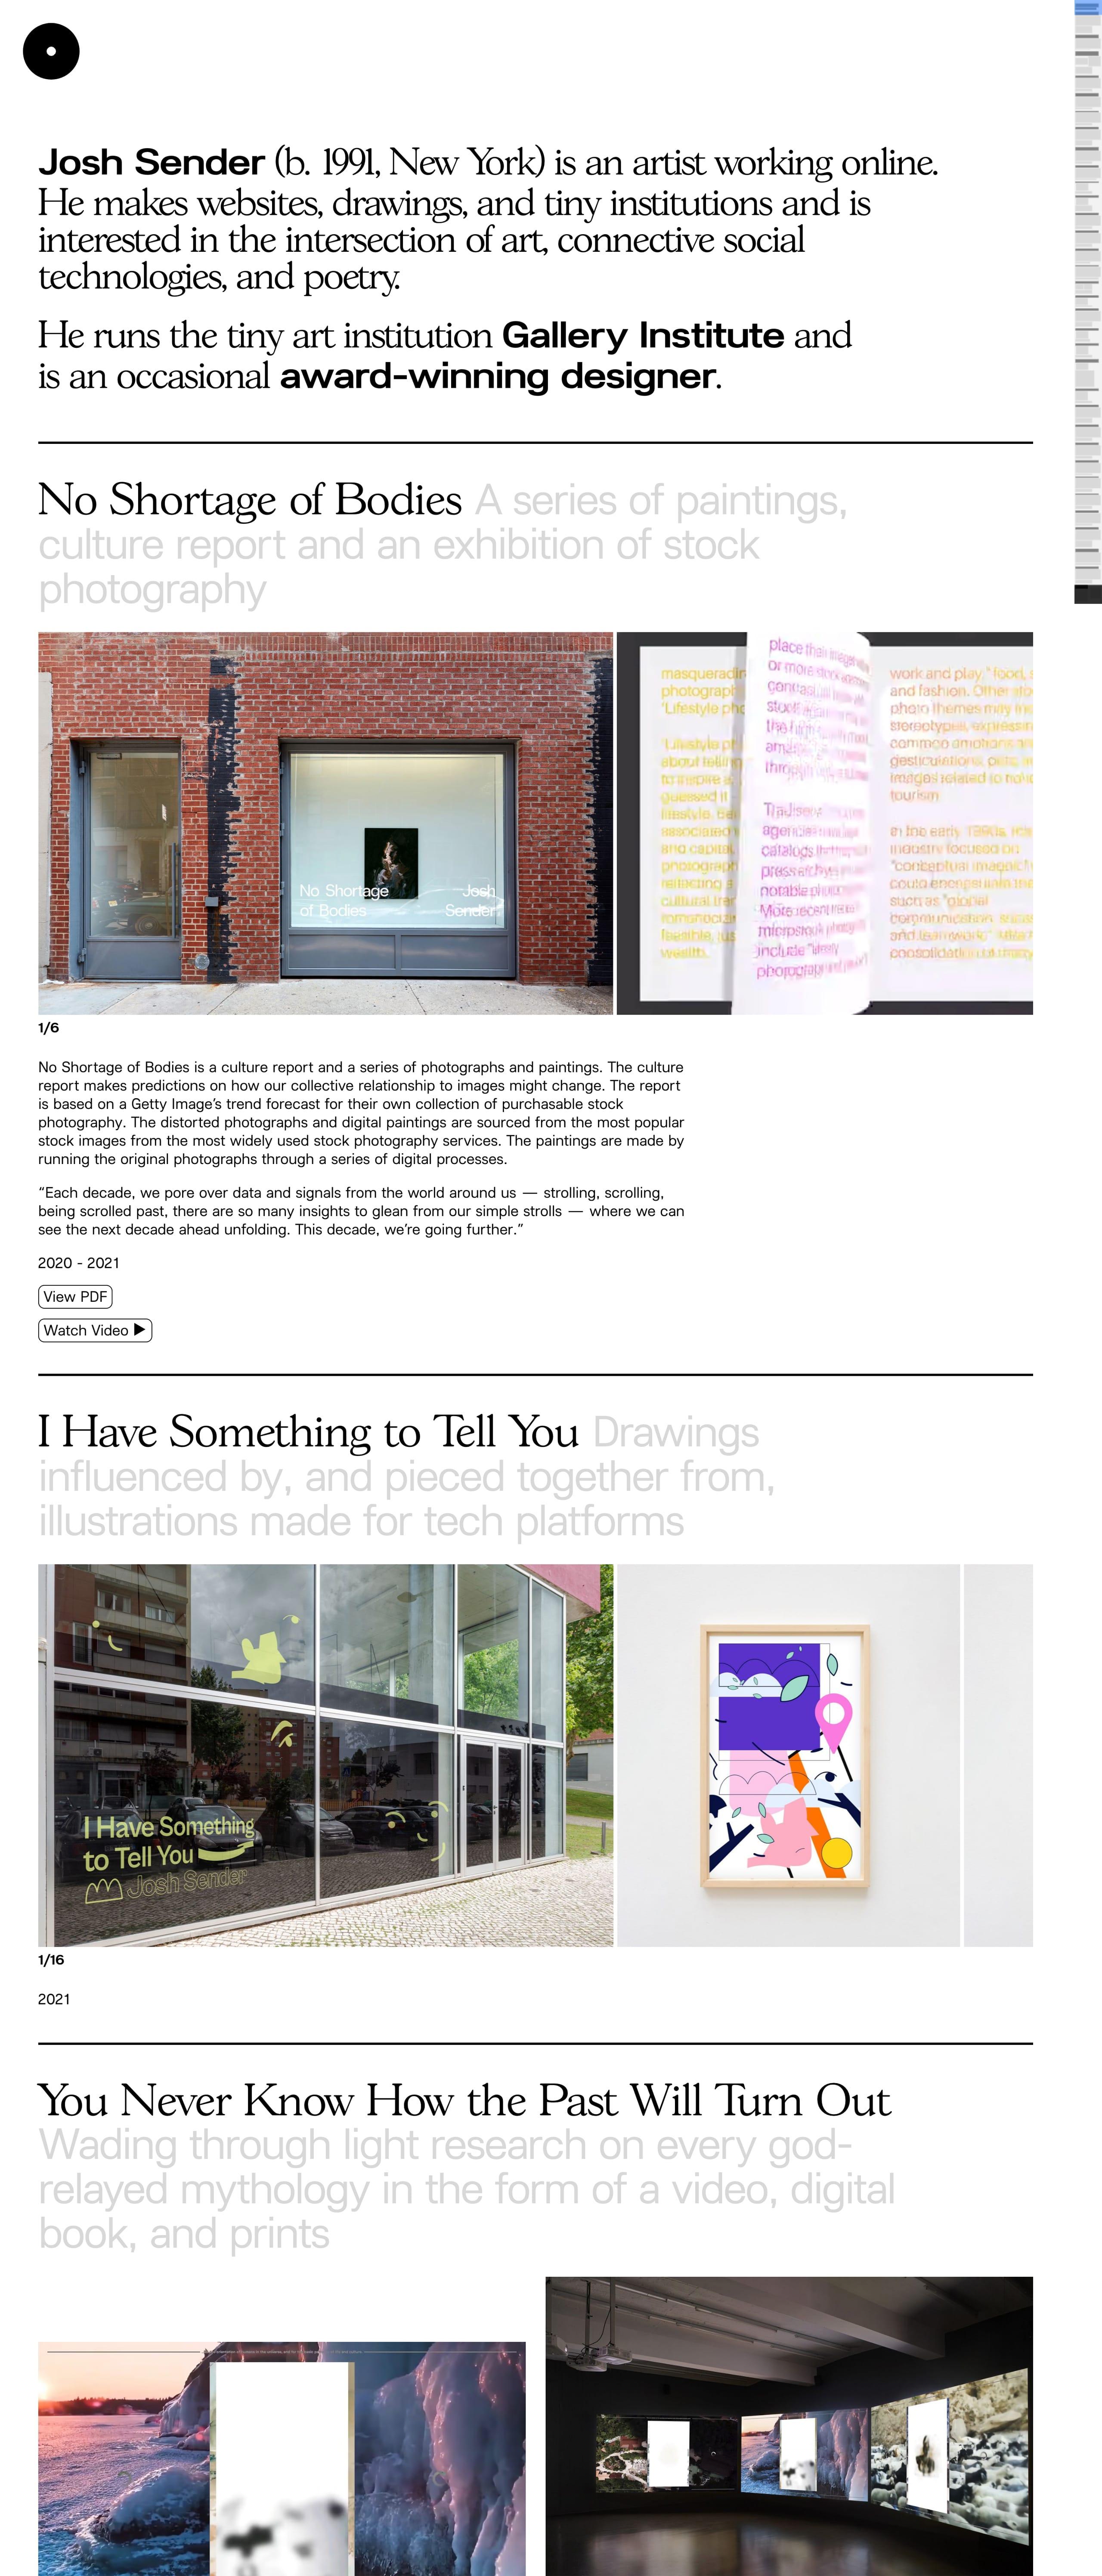 Josh Sender Website Screenshot